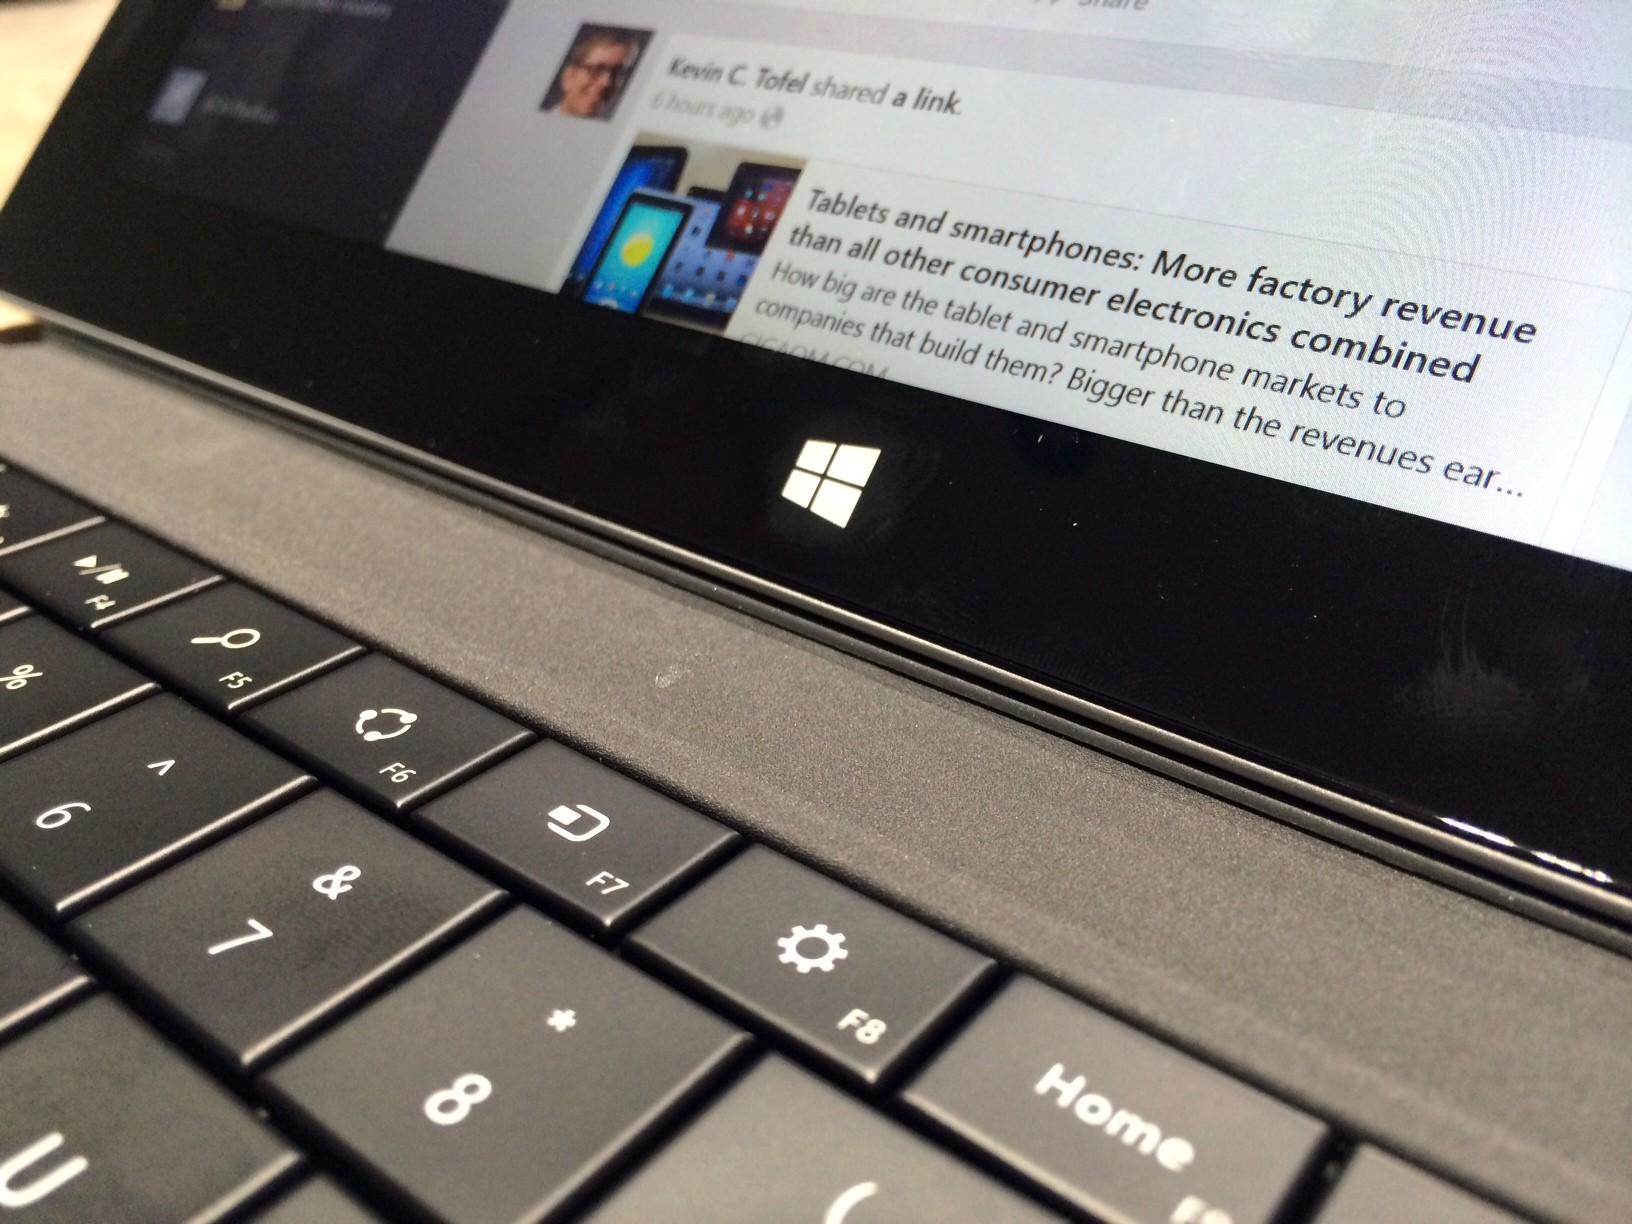 Surface 2 Windows